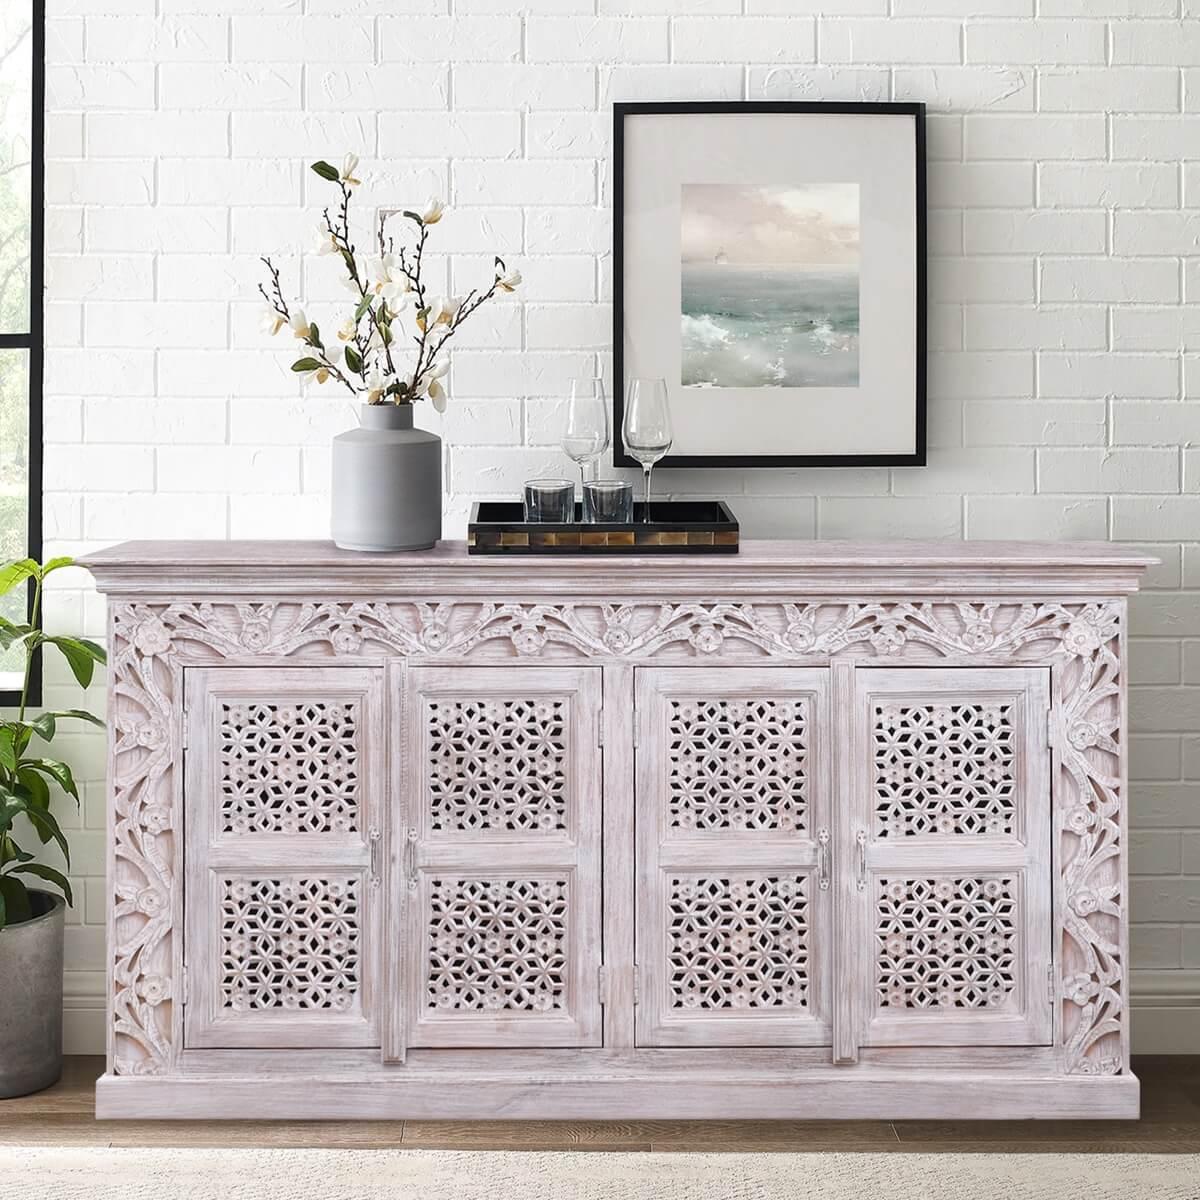 Seymour Rustic Solid Wood Lattice Door White Large Sideboard Cabinet